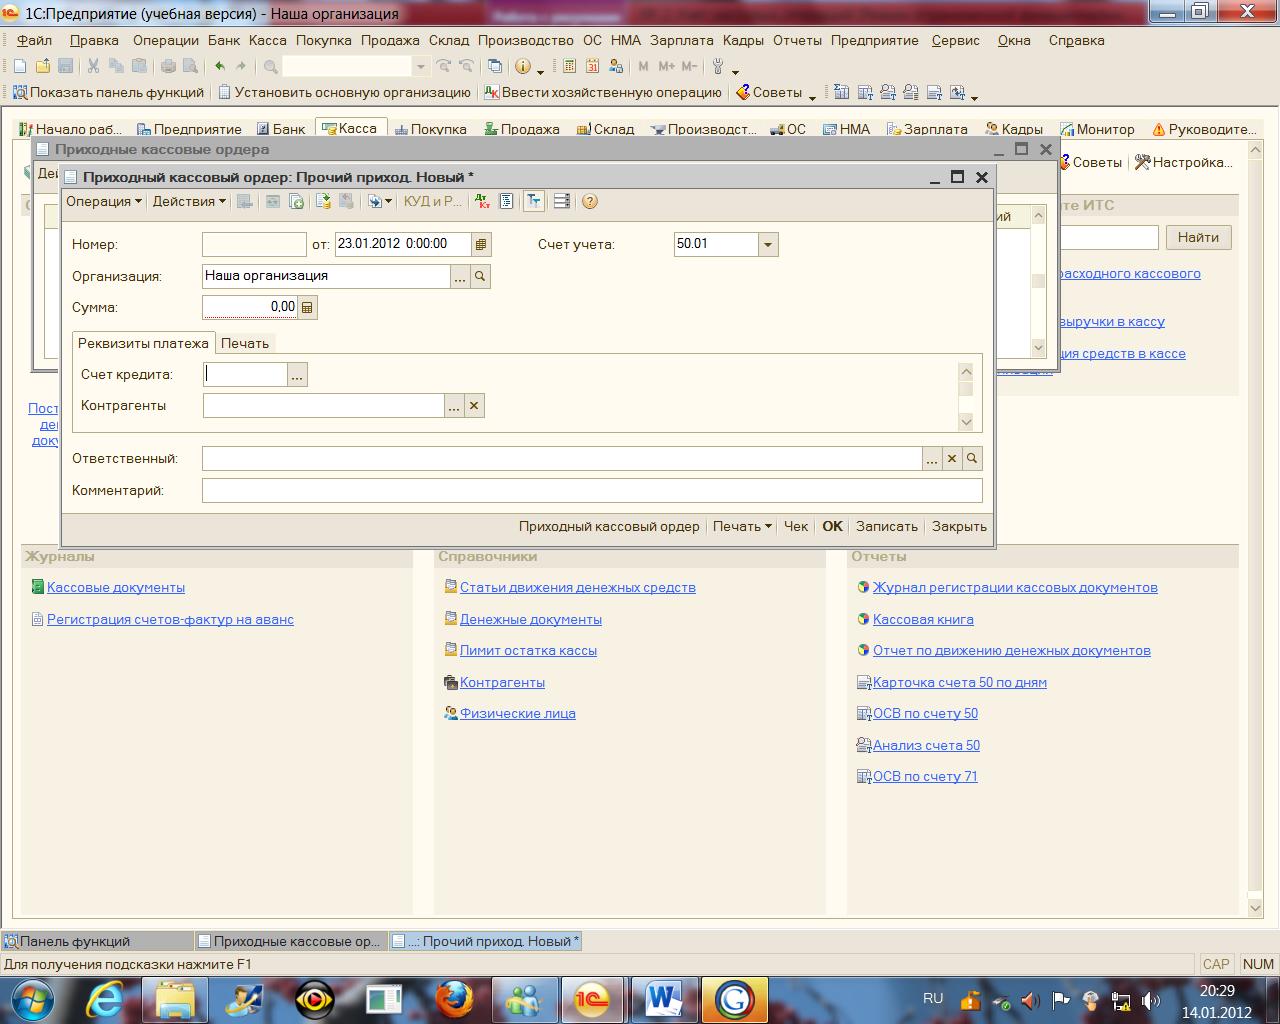 hello_html_fb8cc2.png